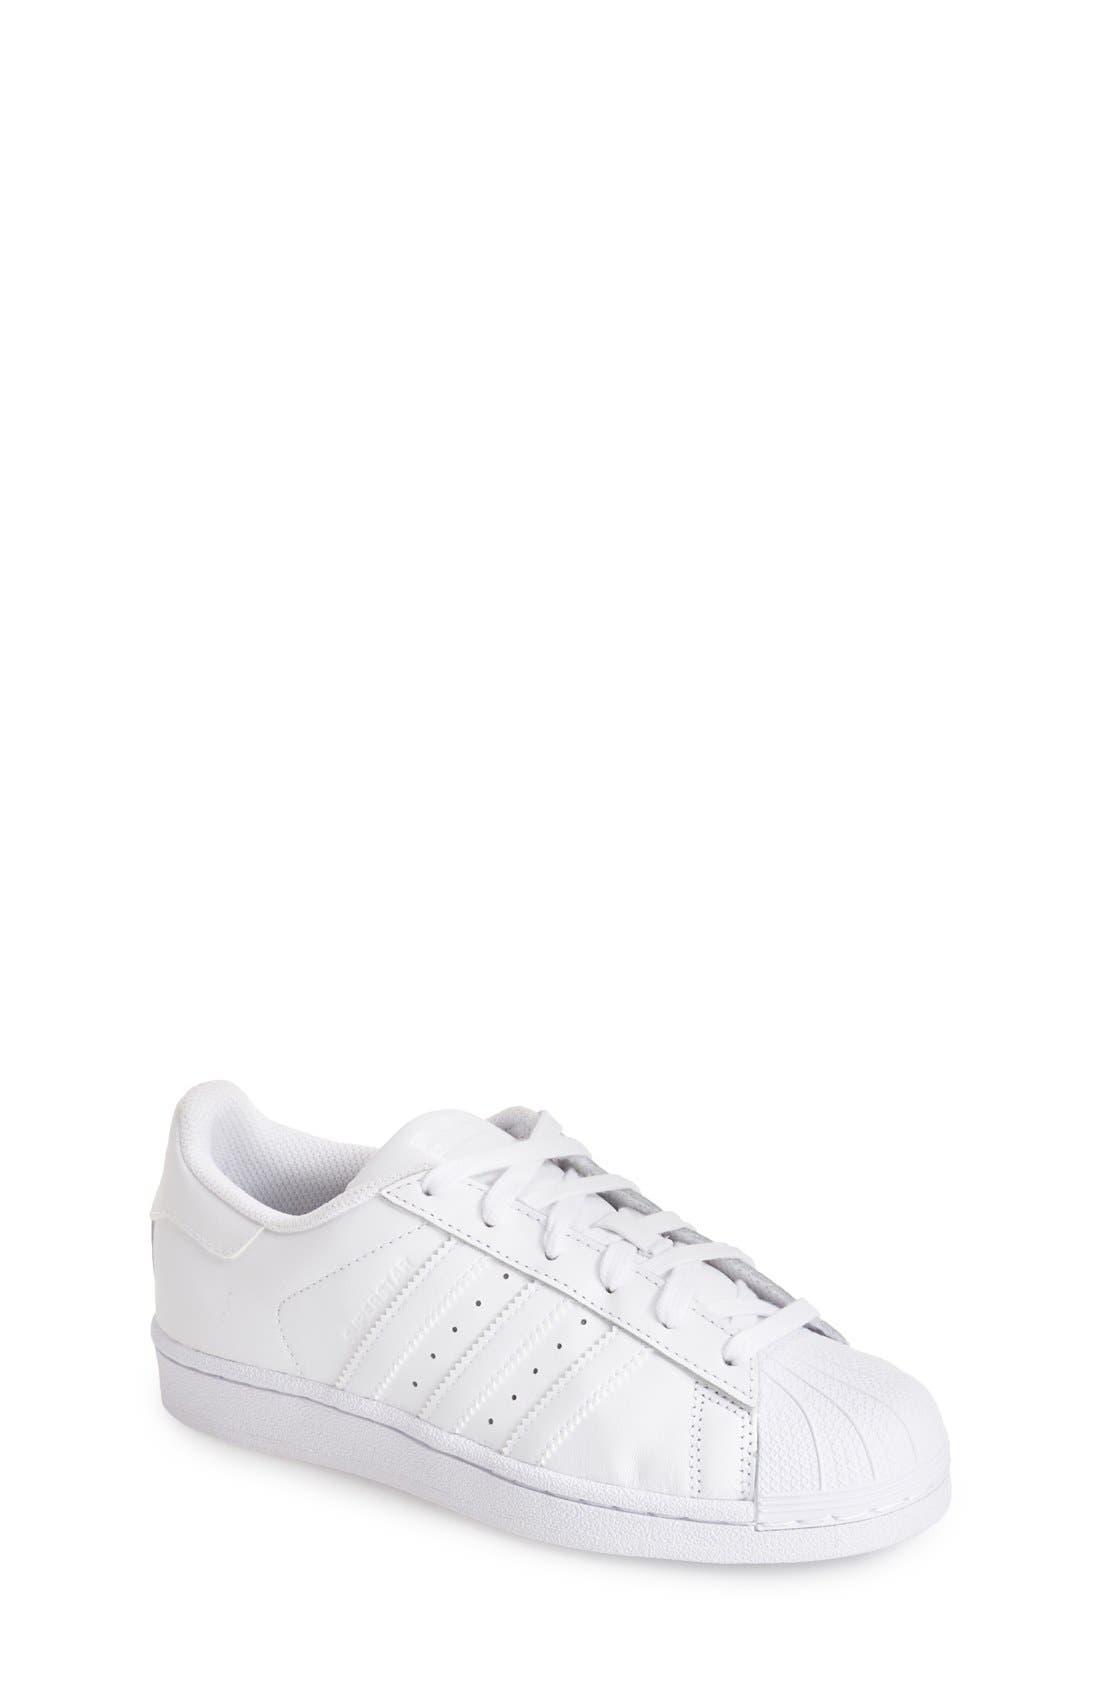 Main Image - adidas \u0027Superstar 2\u0027 Sneaker (Big Kid)